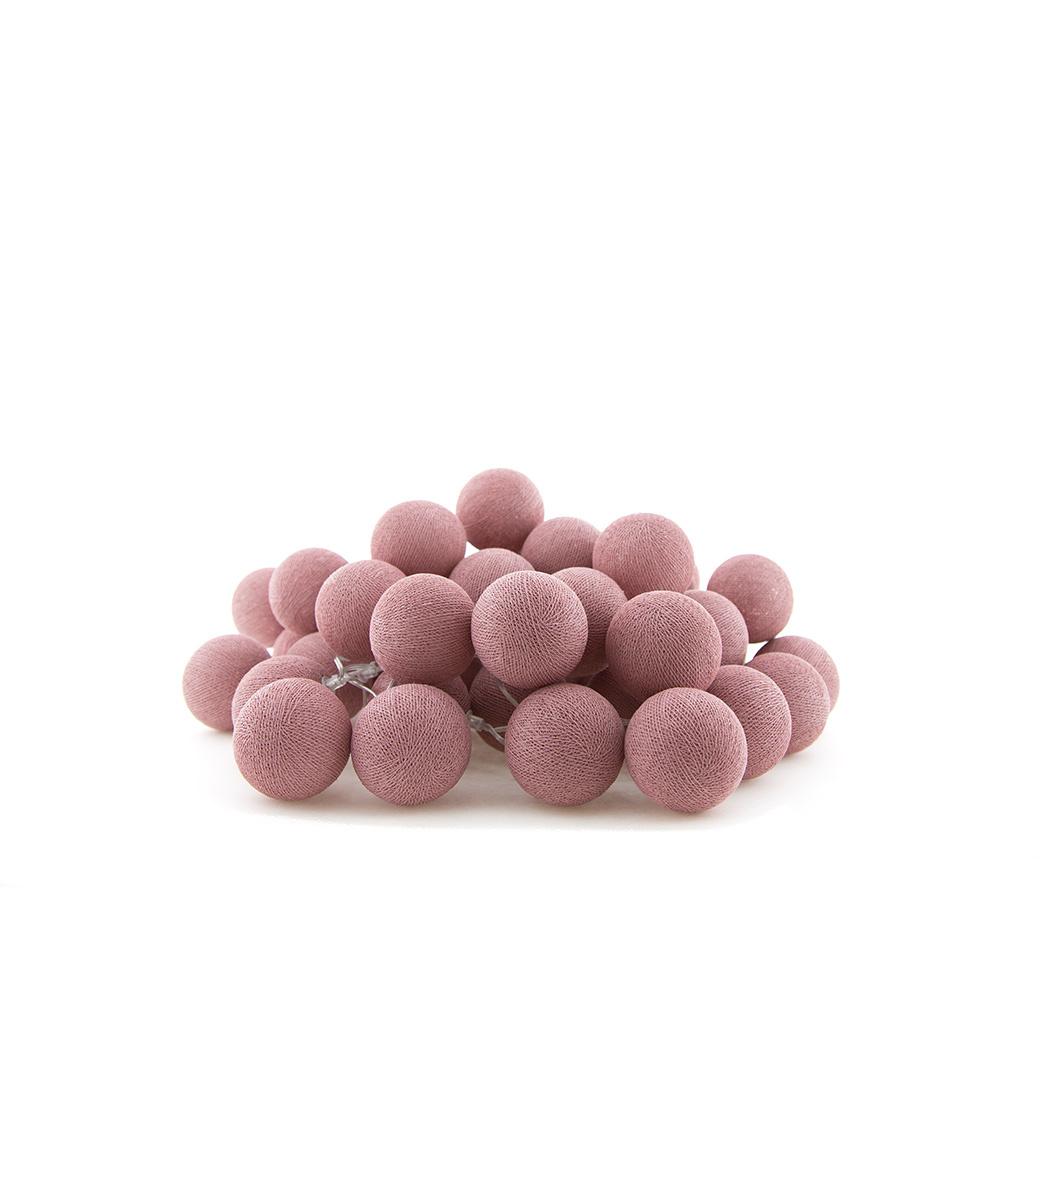 Cotton Ball Lights regular Lichtslinger - Rose